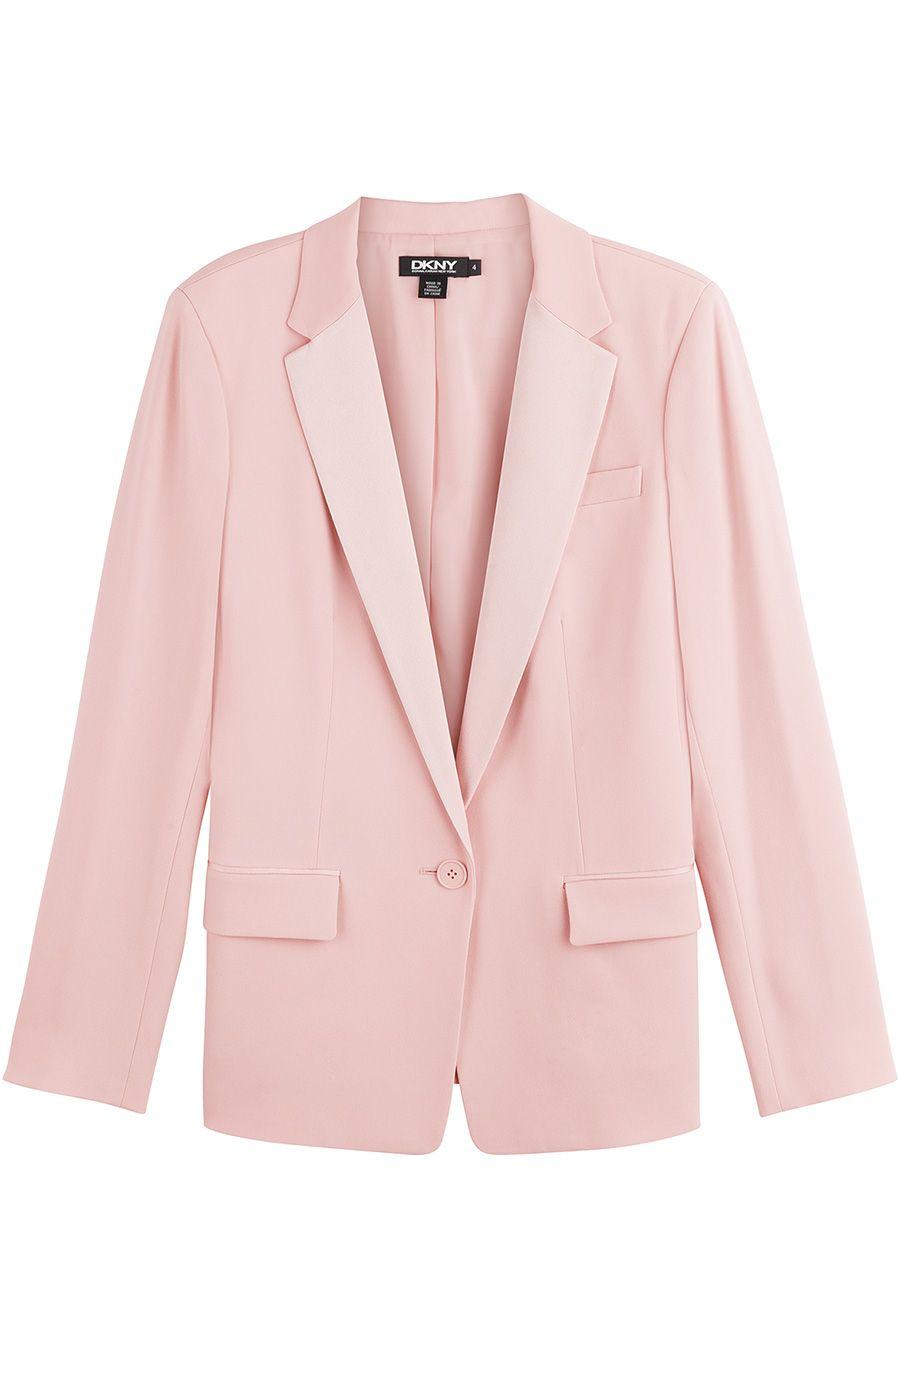 Notched collar blazer detail blazers and coats pinterest